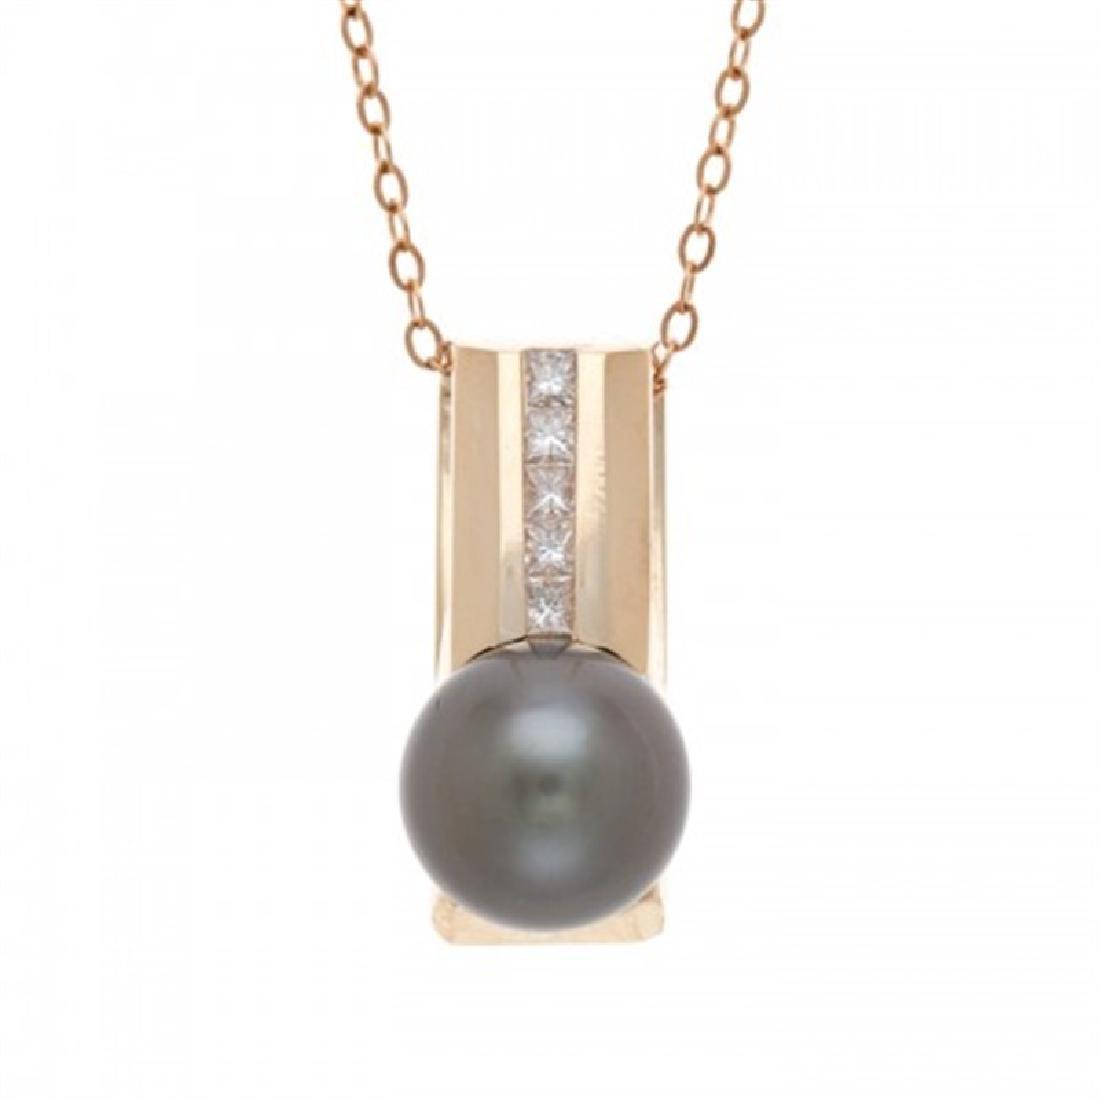 9.5-10.0mm Tahitian Black Pendant with Diamonds